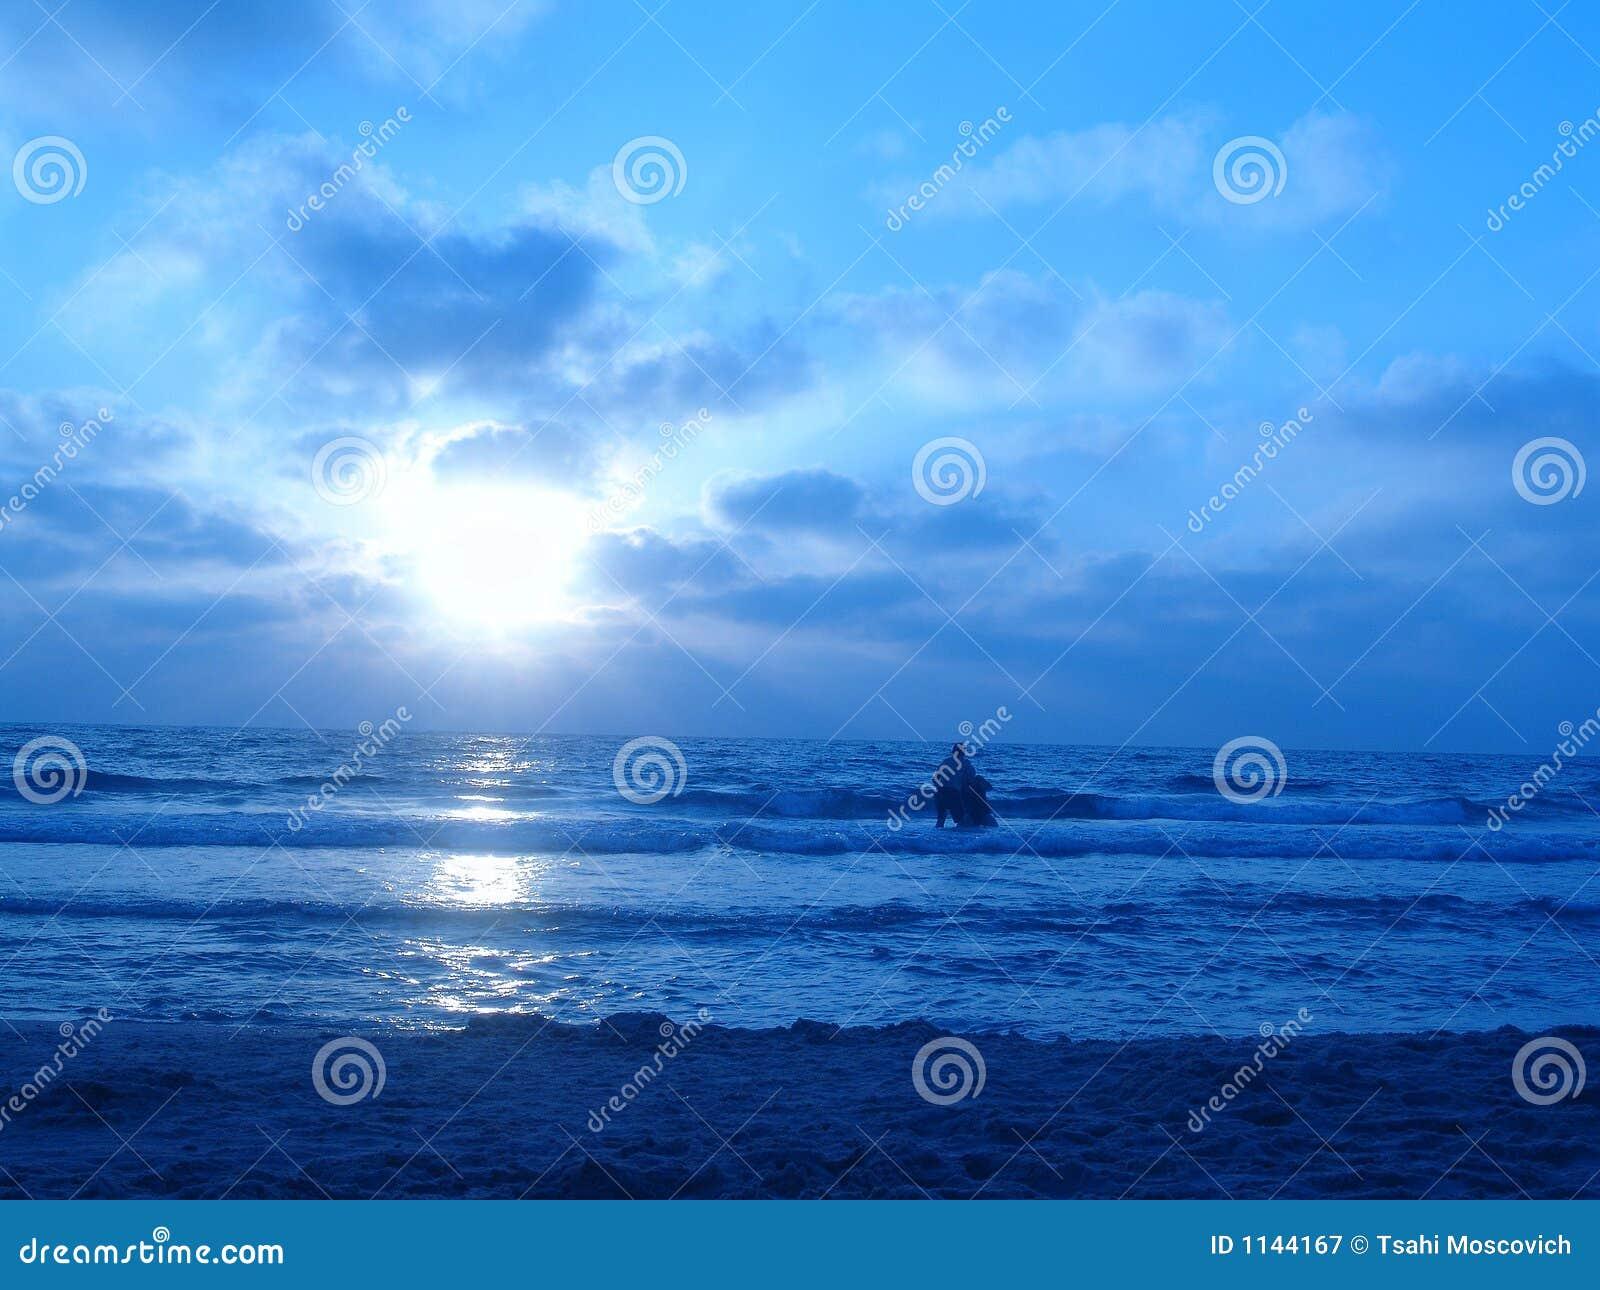 Blue Sunset Royalty Free Stock Photography - Image: 1144167